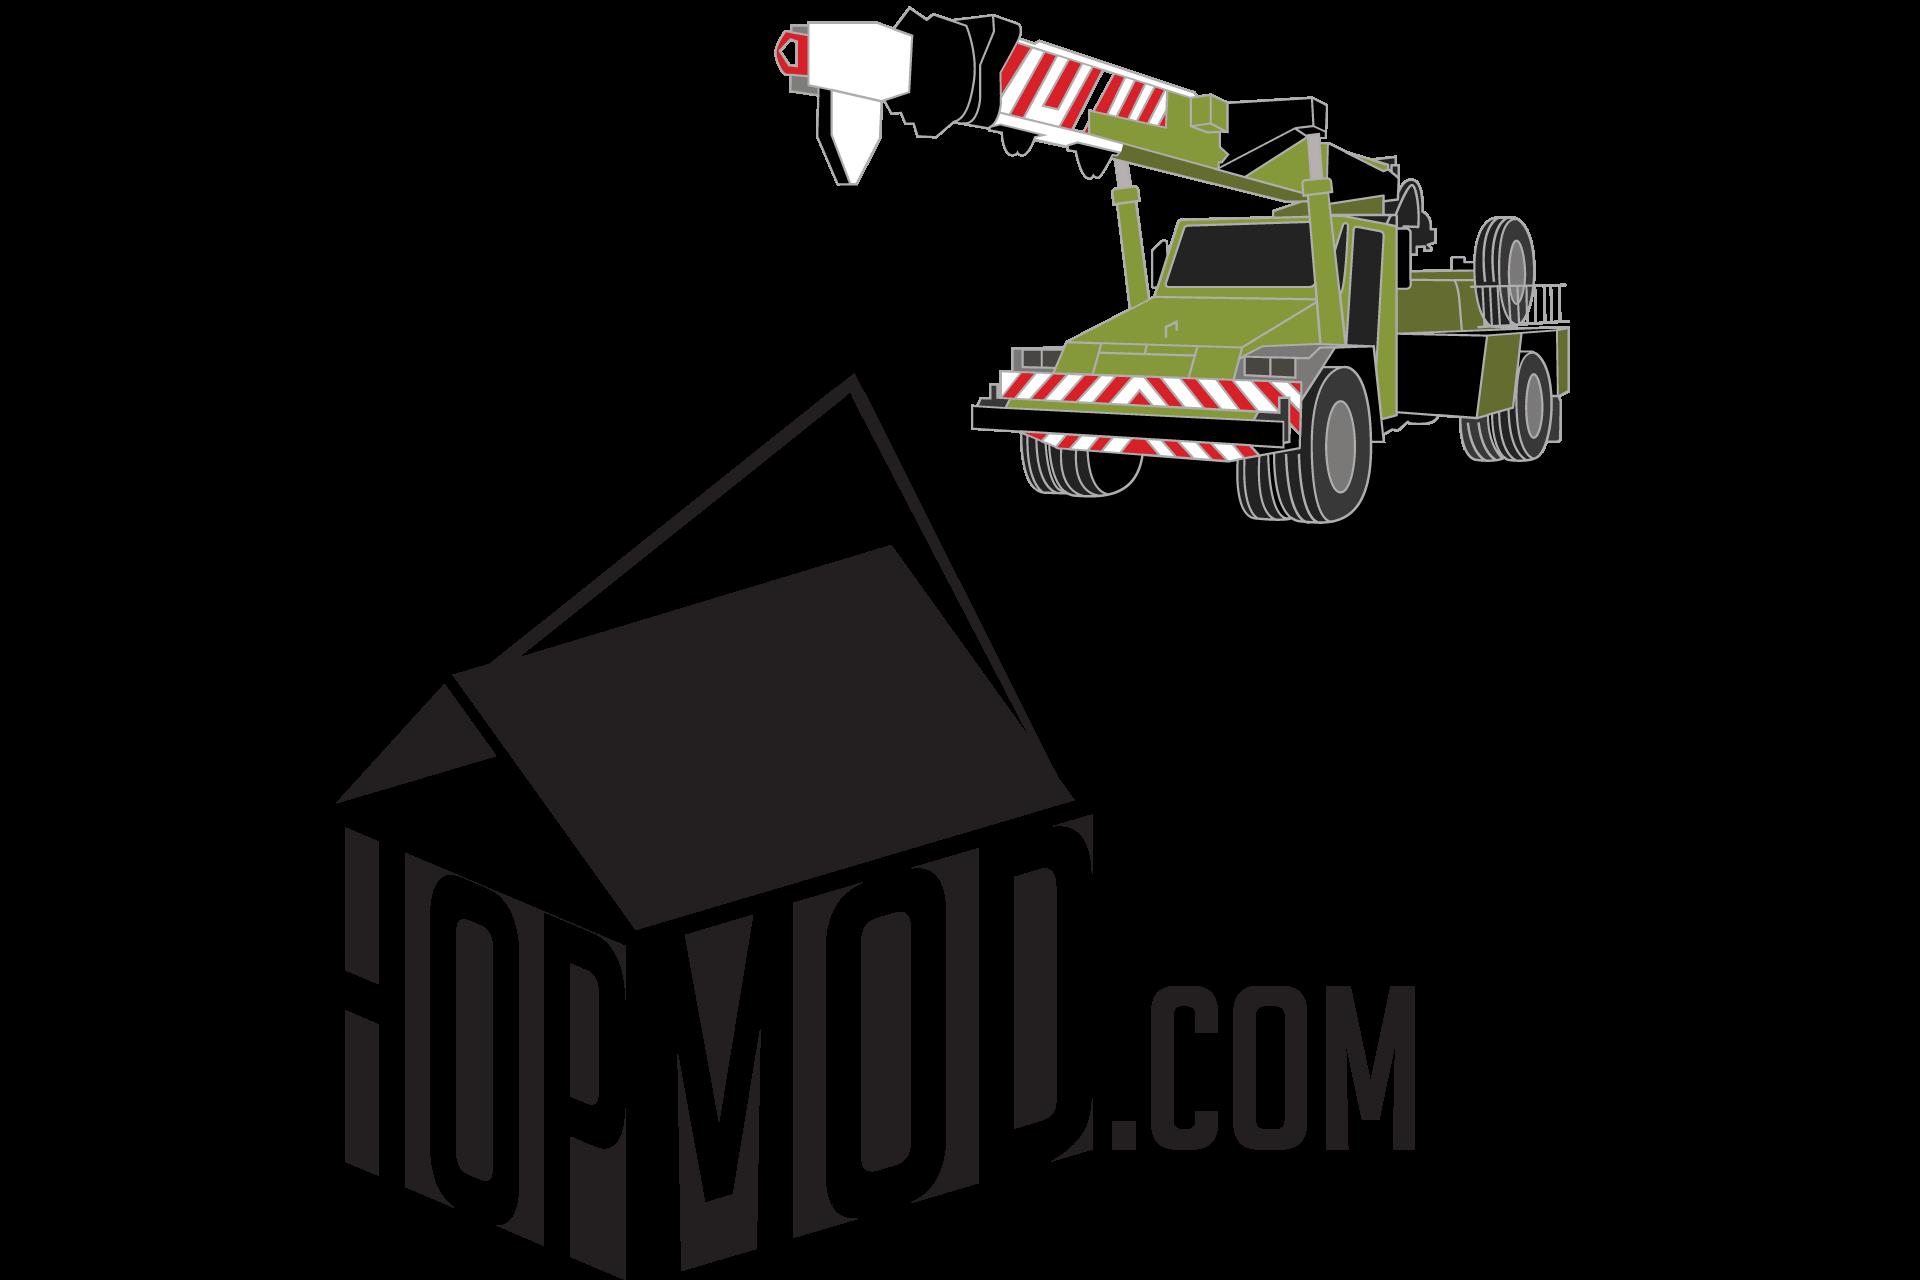 HopMod